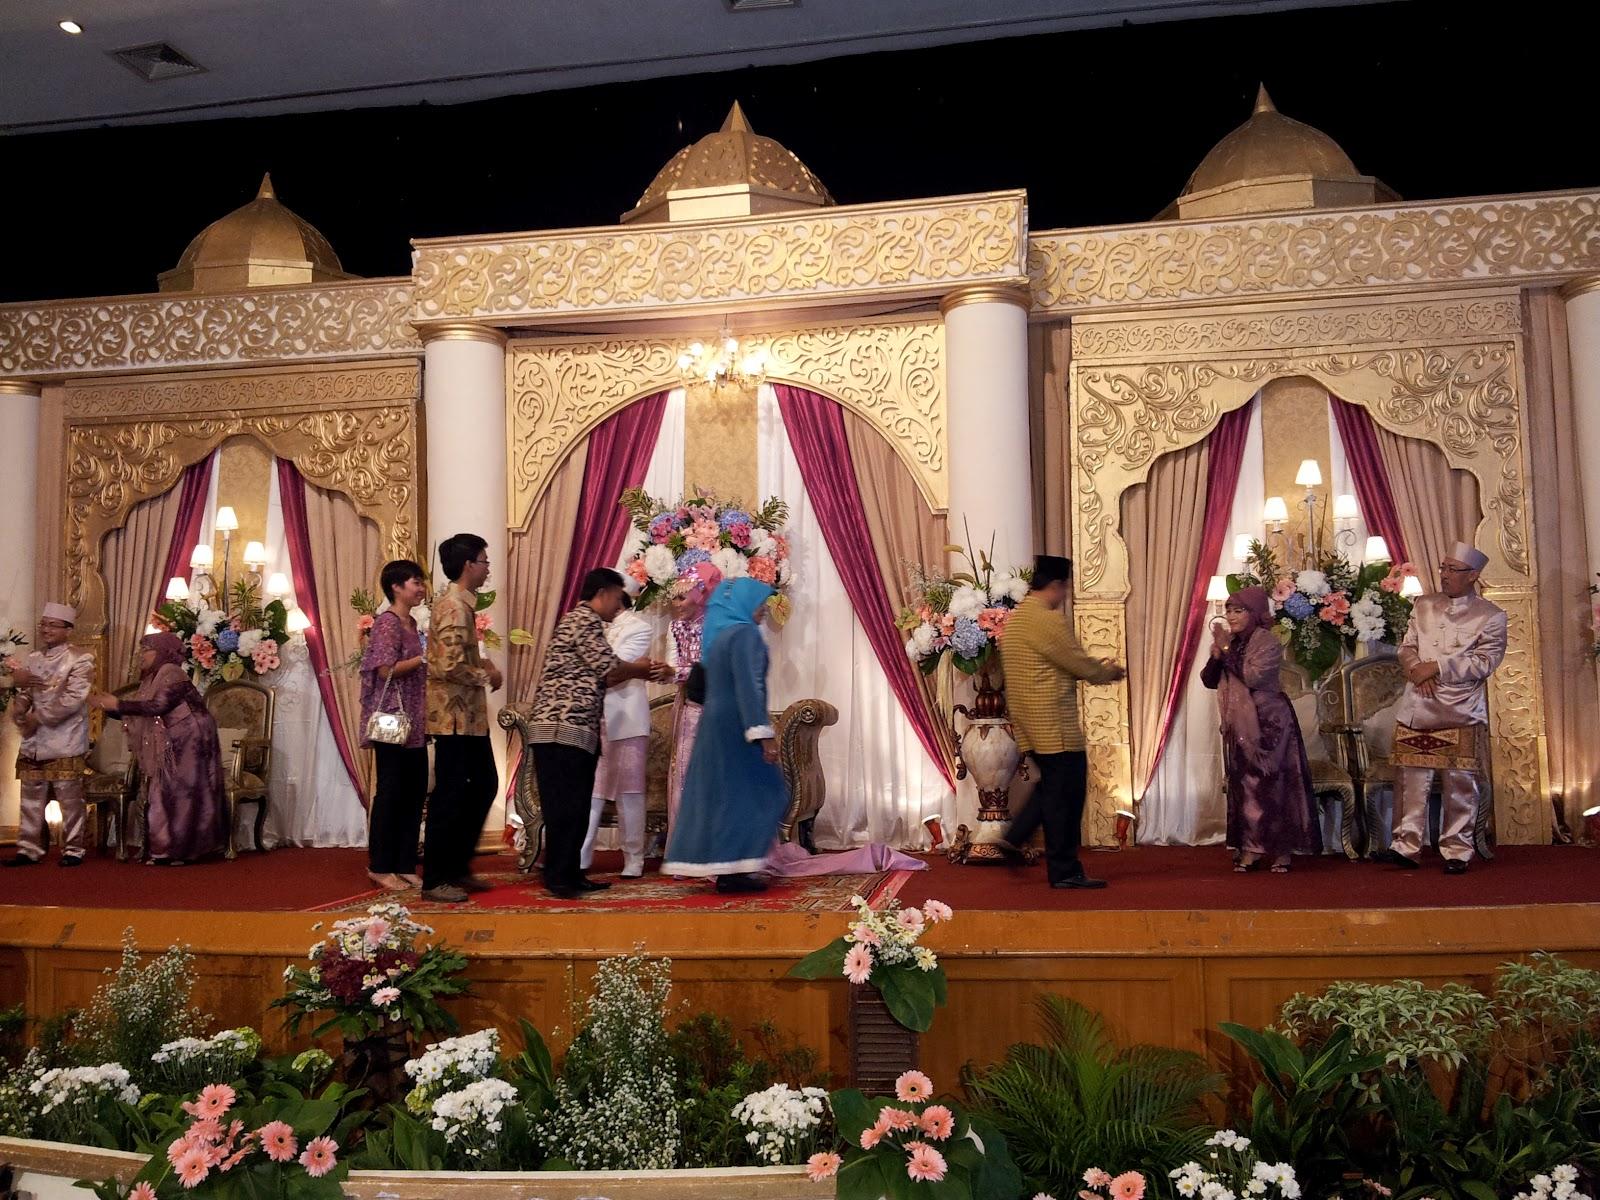 dekorasi pelaminan jeng aka & suami model kubah ala nuansa maroko